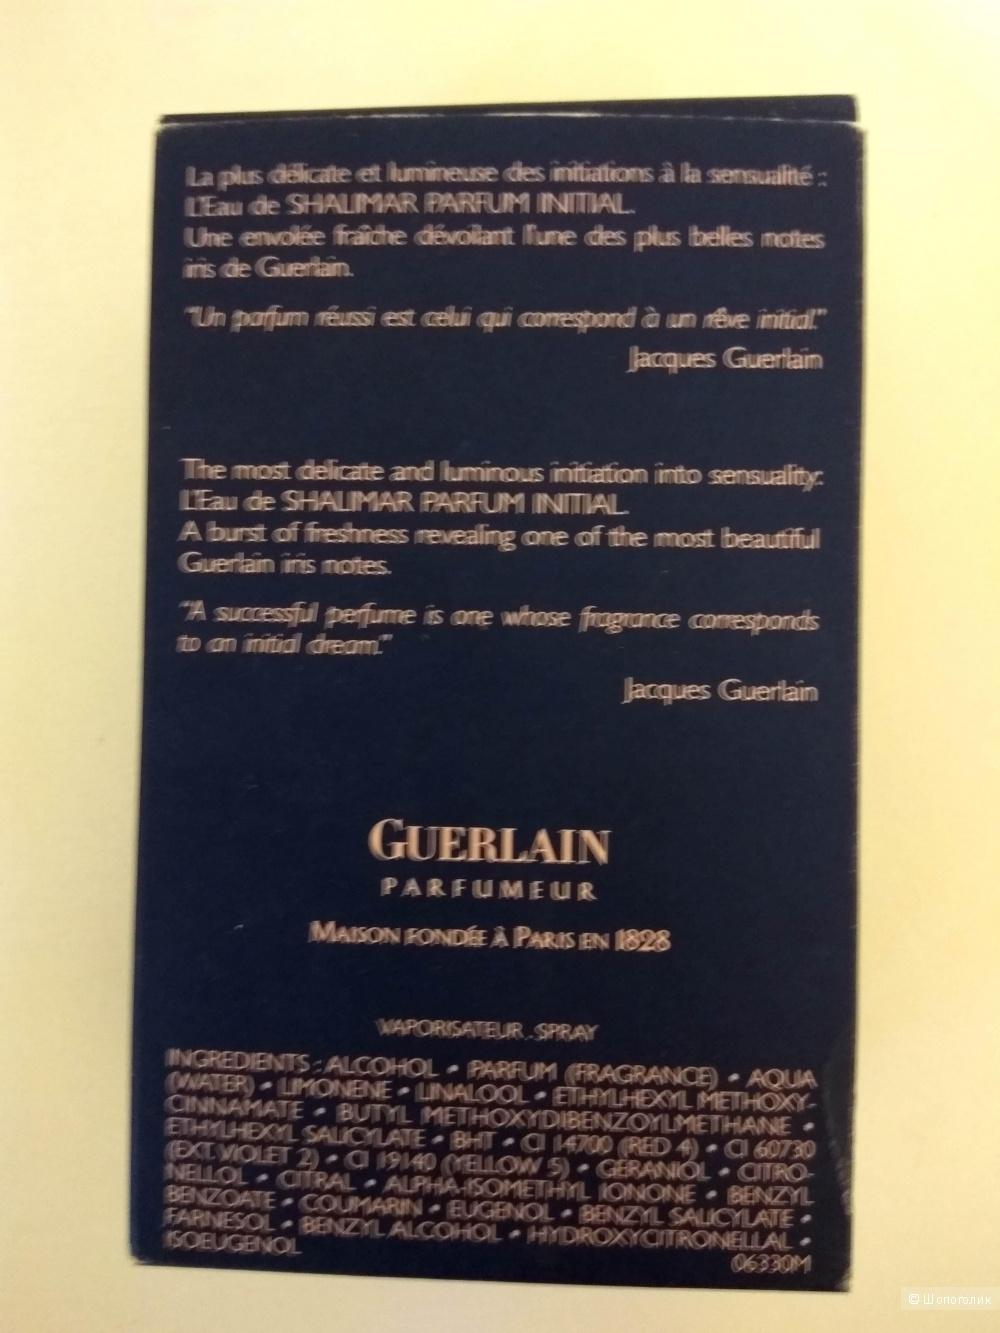 Shalimar Parfum Initial Guerlain аромат 40 мл.